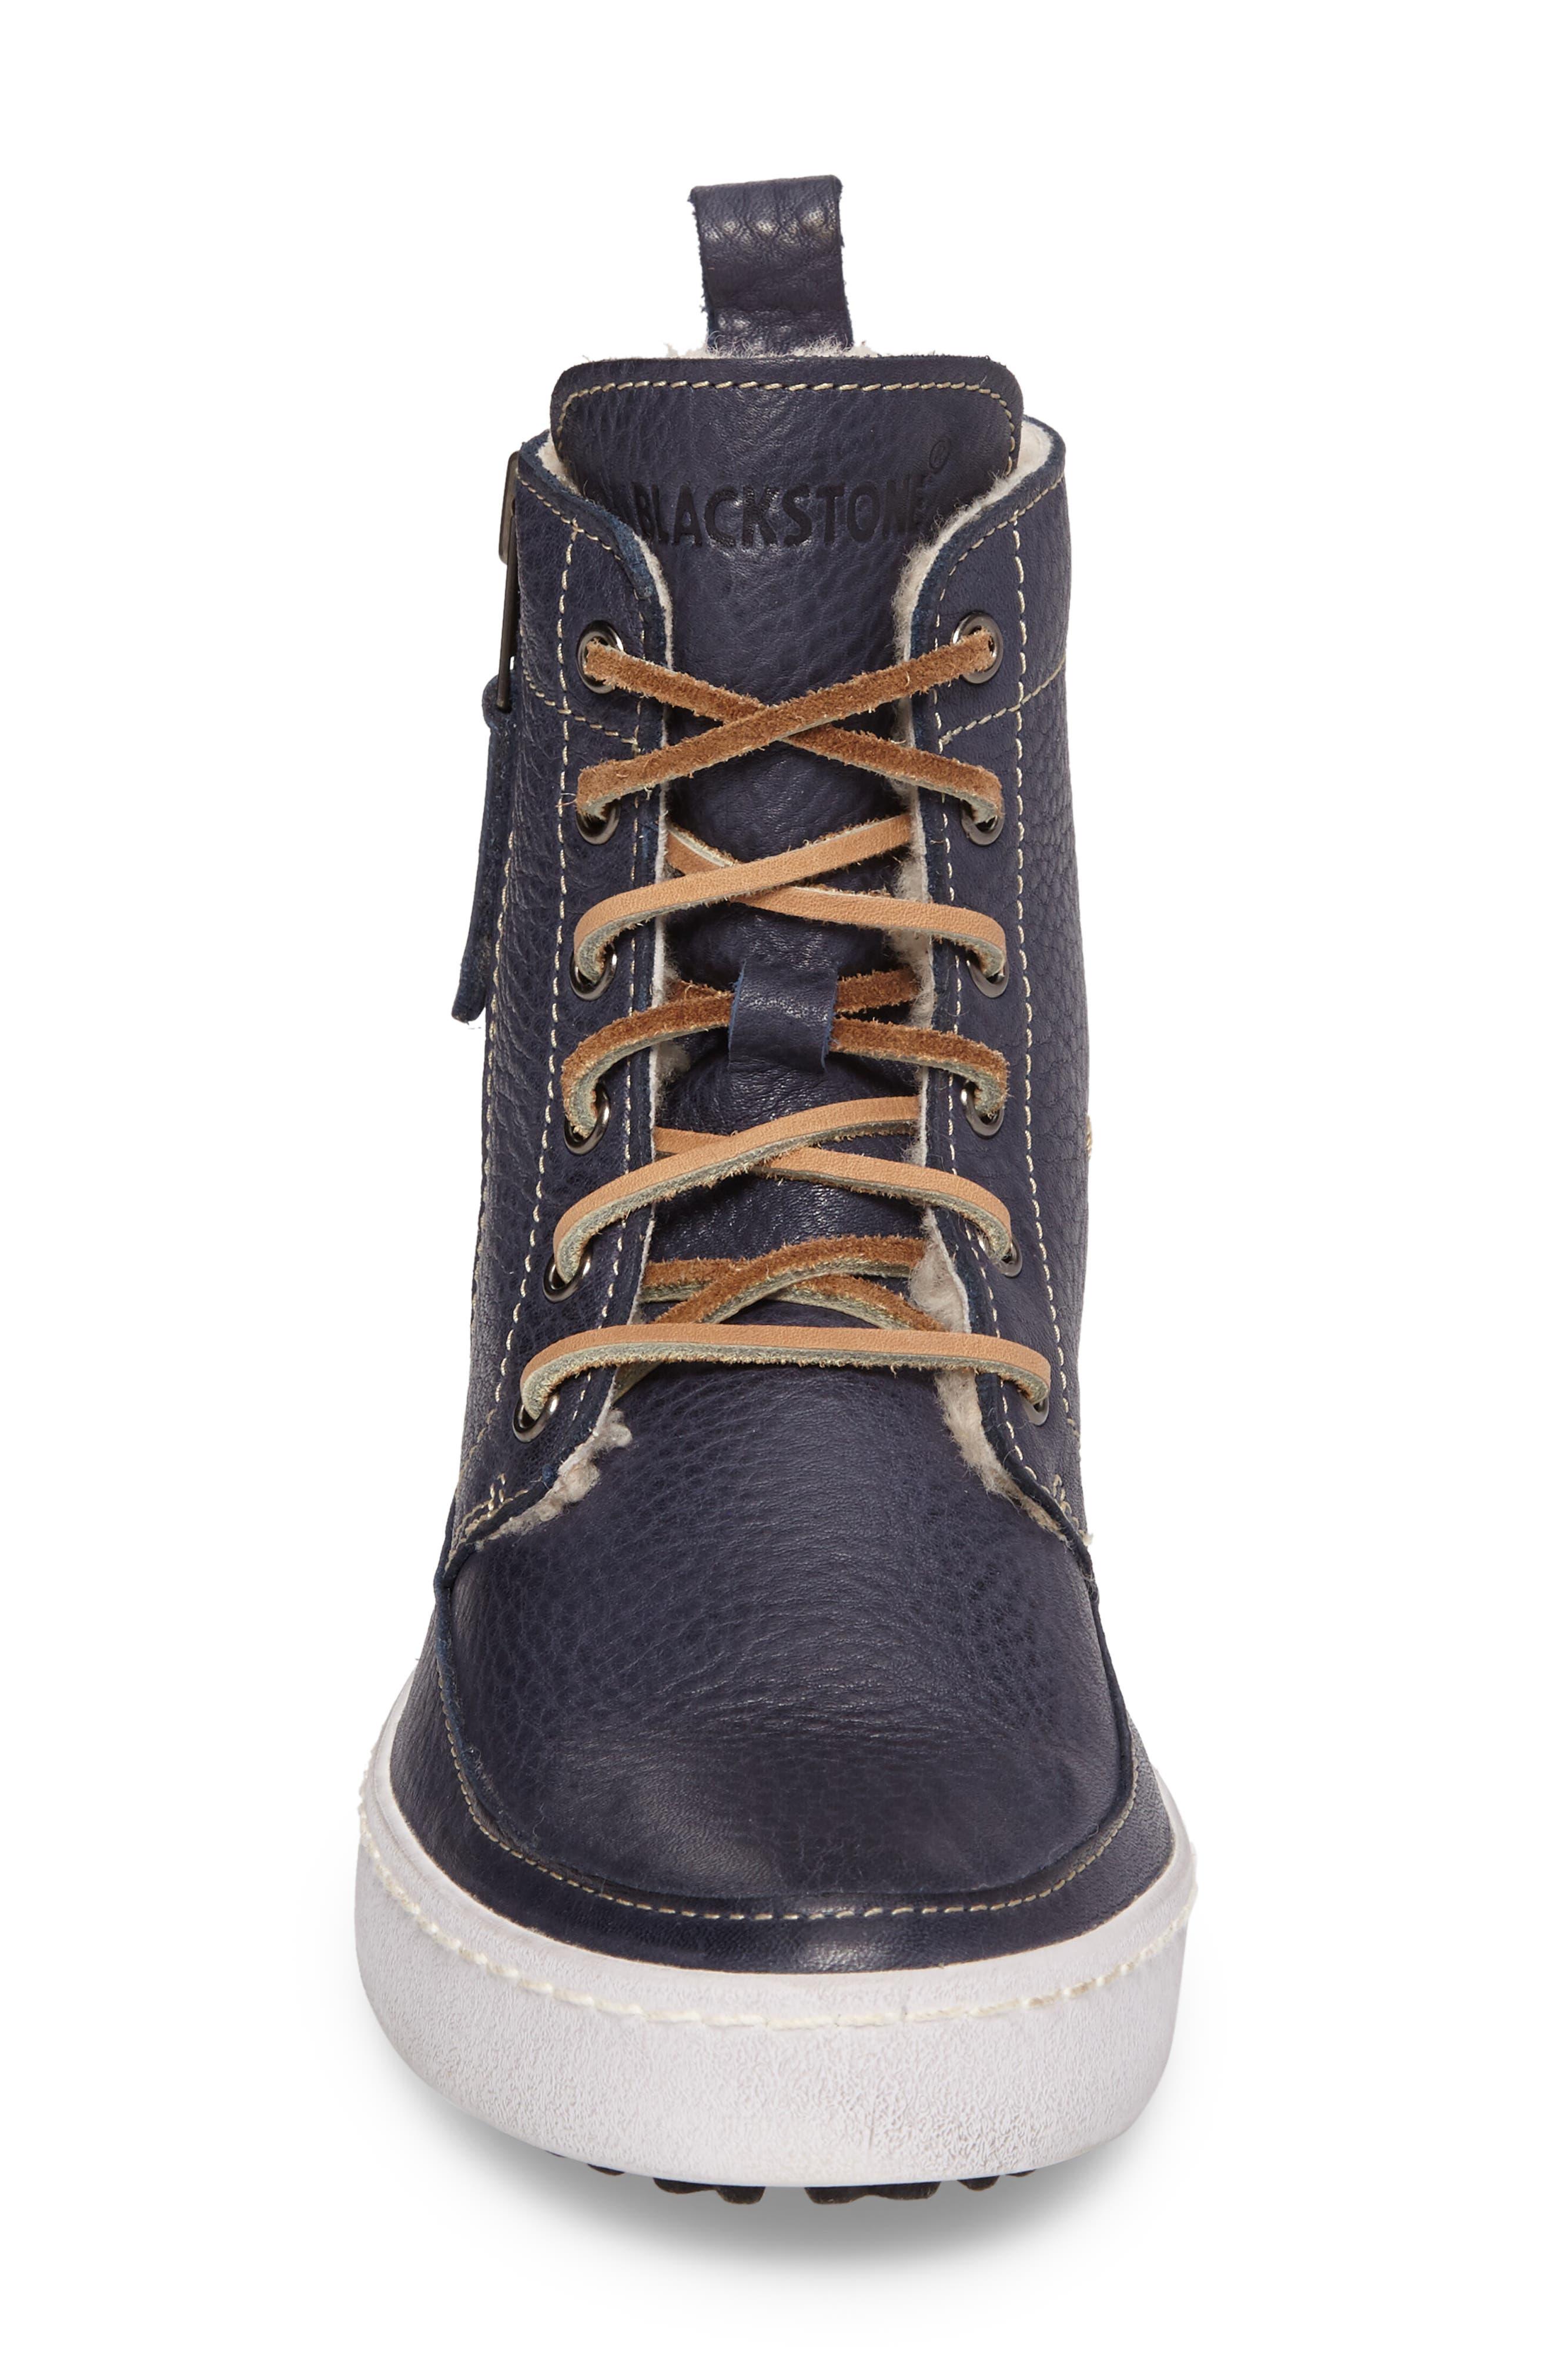 Alternate Image 4  - Blackstone 'CW96' Genuine Shearling Lined Sneaker Boot (Women)